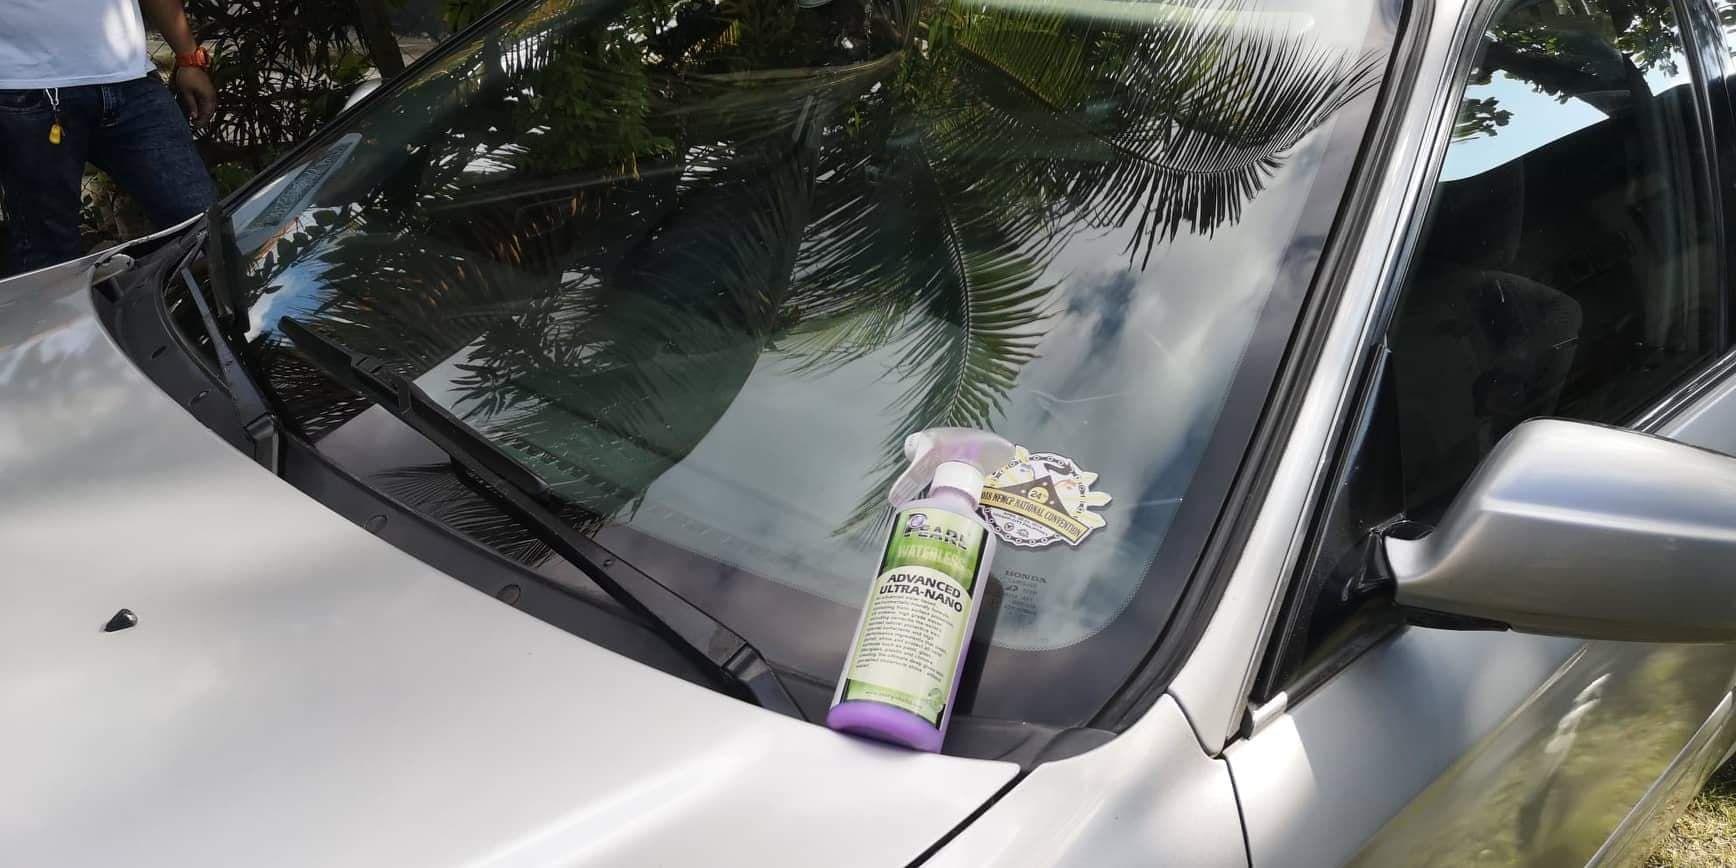 Advanced Ultra Nano Car wash solutions, Waterless